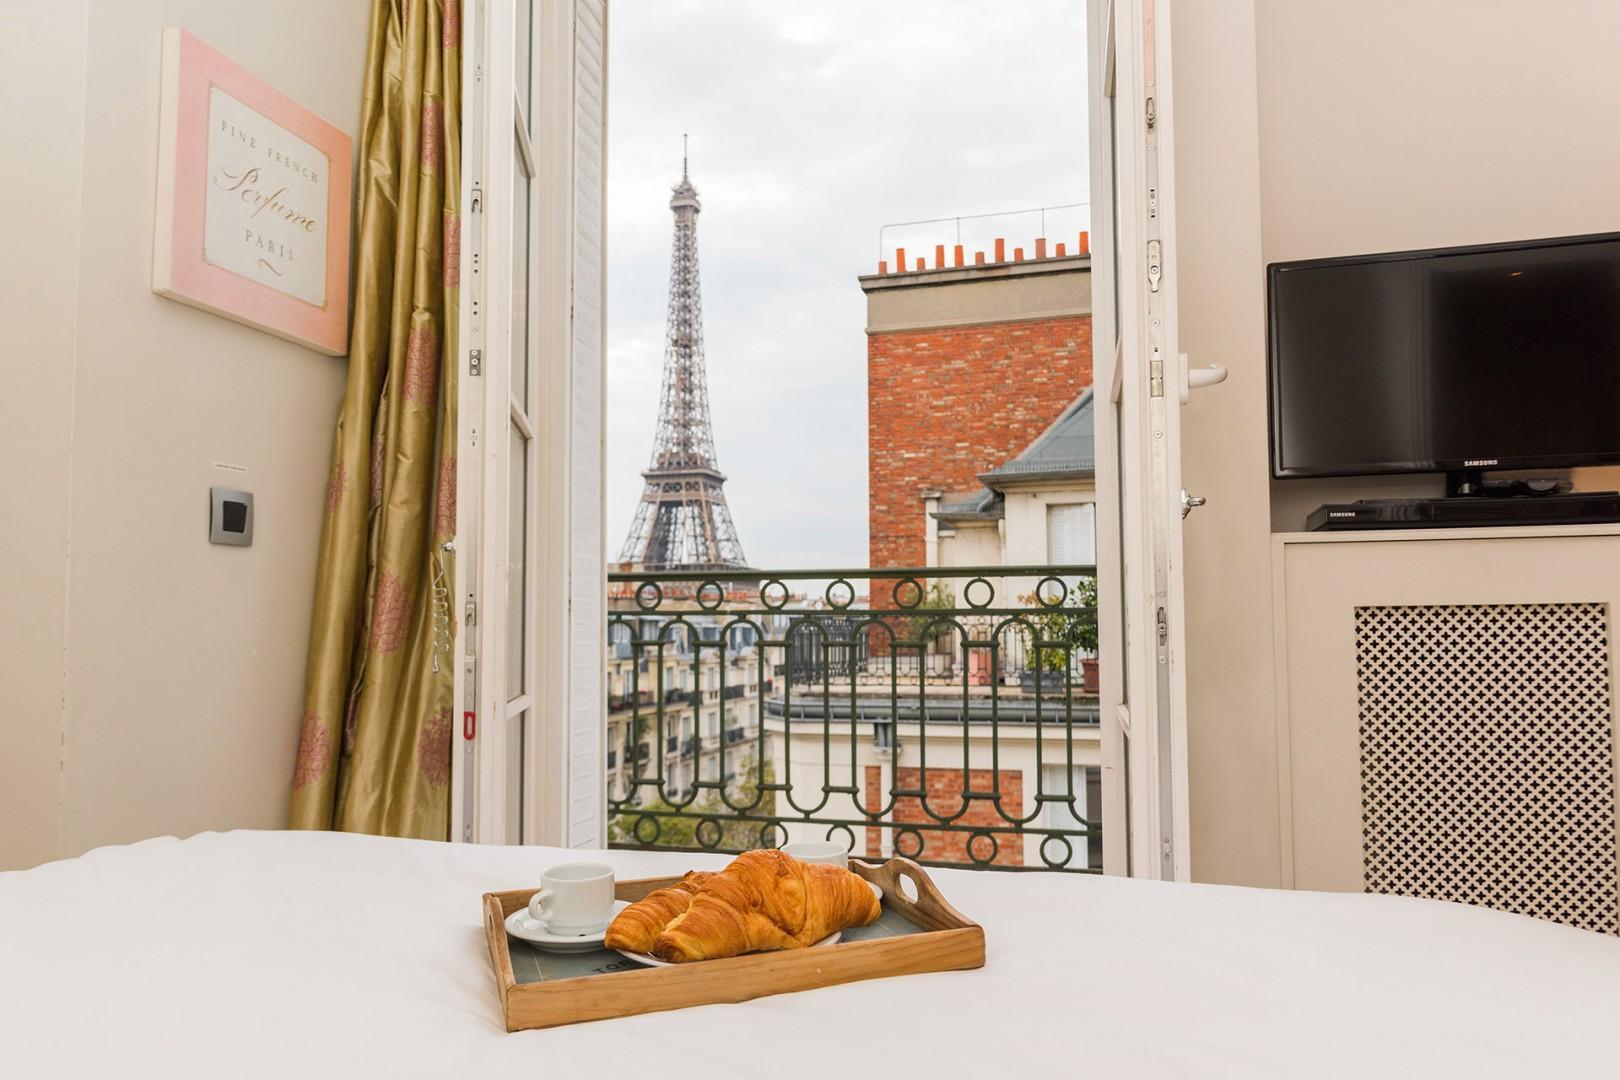 Imagine waking up to this Parisian view!